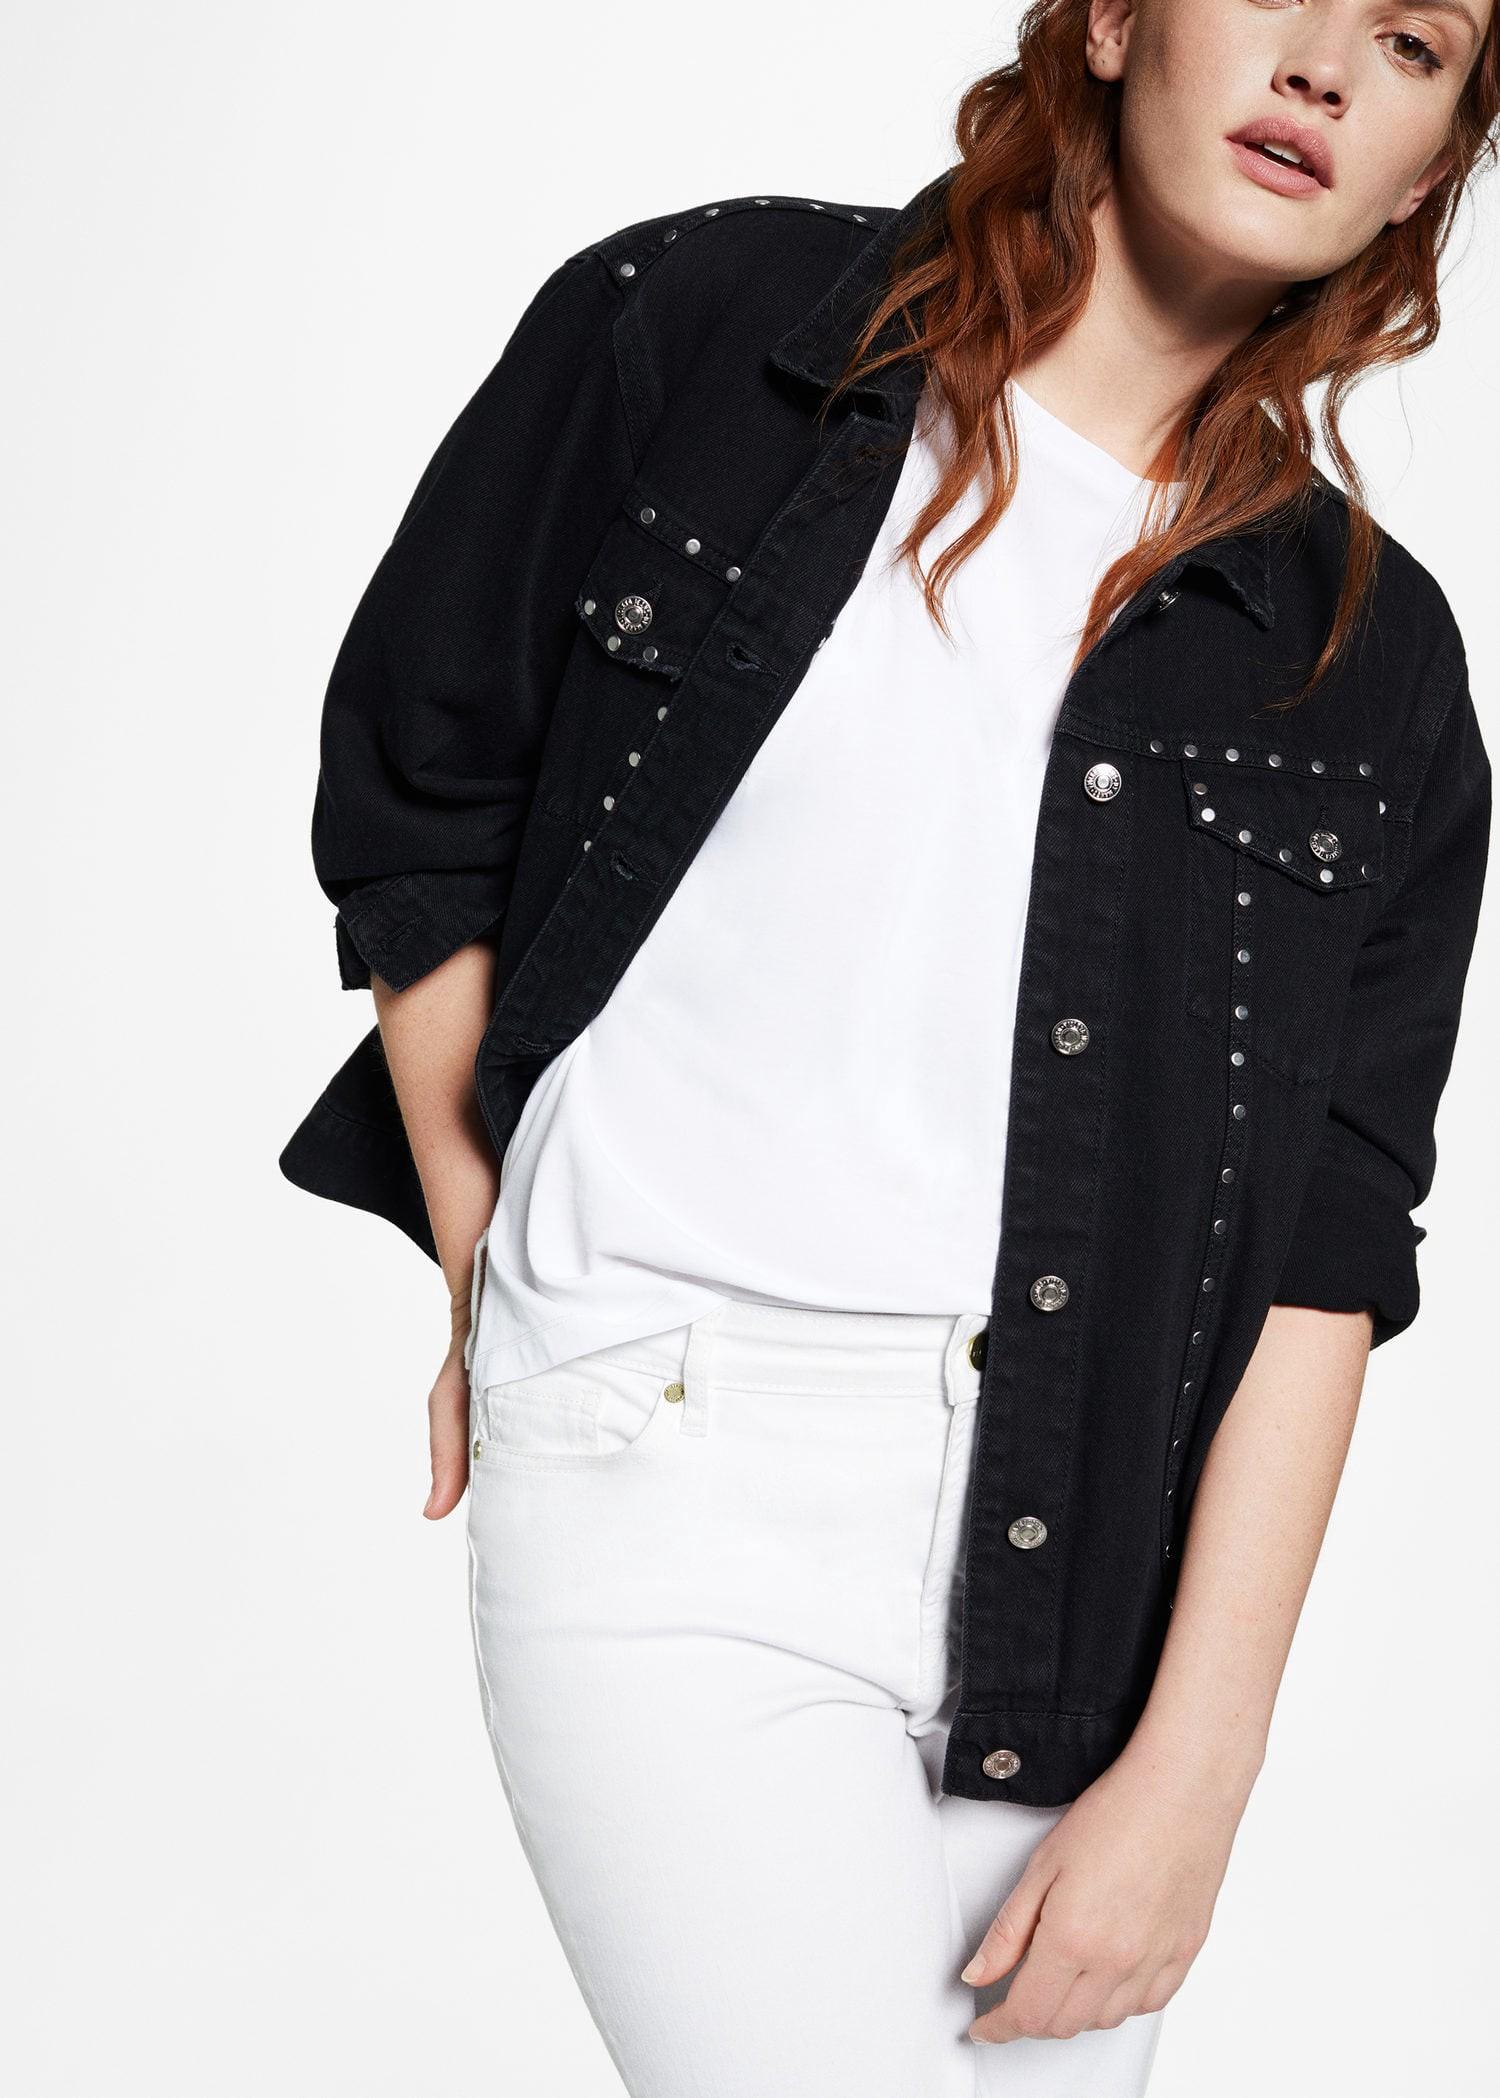 a061e35691fc24 Mango Studded Denim Jacket - Plus Sizes | Violeta By XS | Products ...